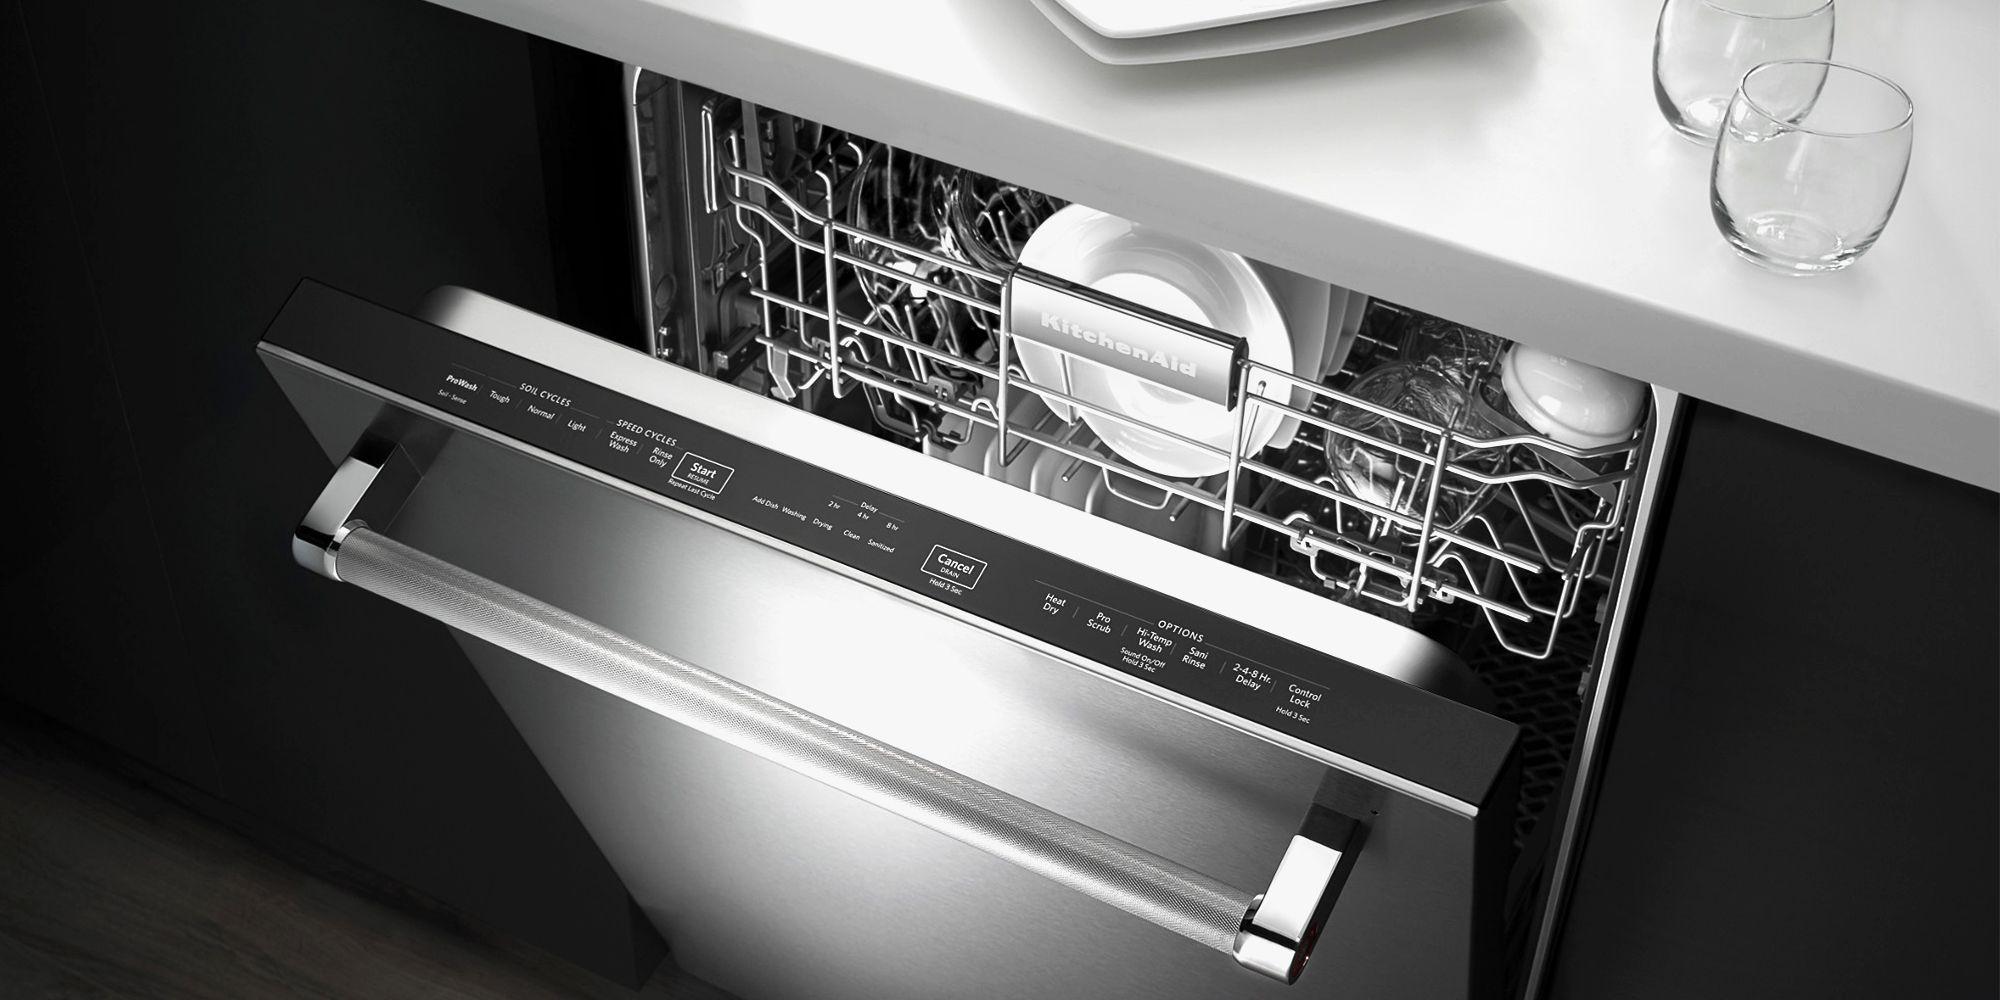 Kitchenaid Best Dishwashers 2018